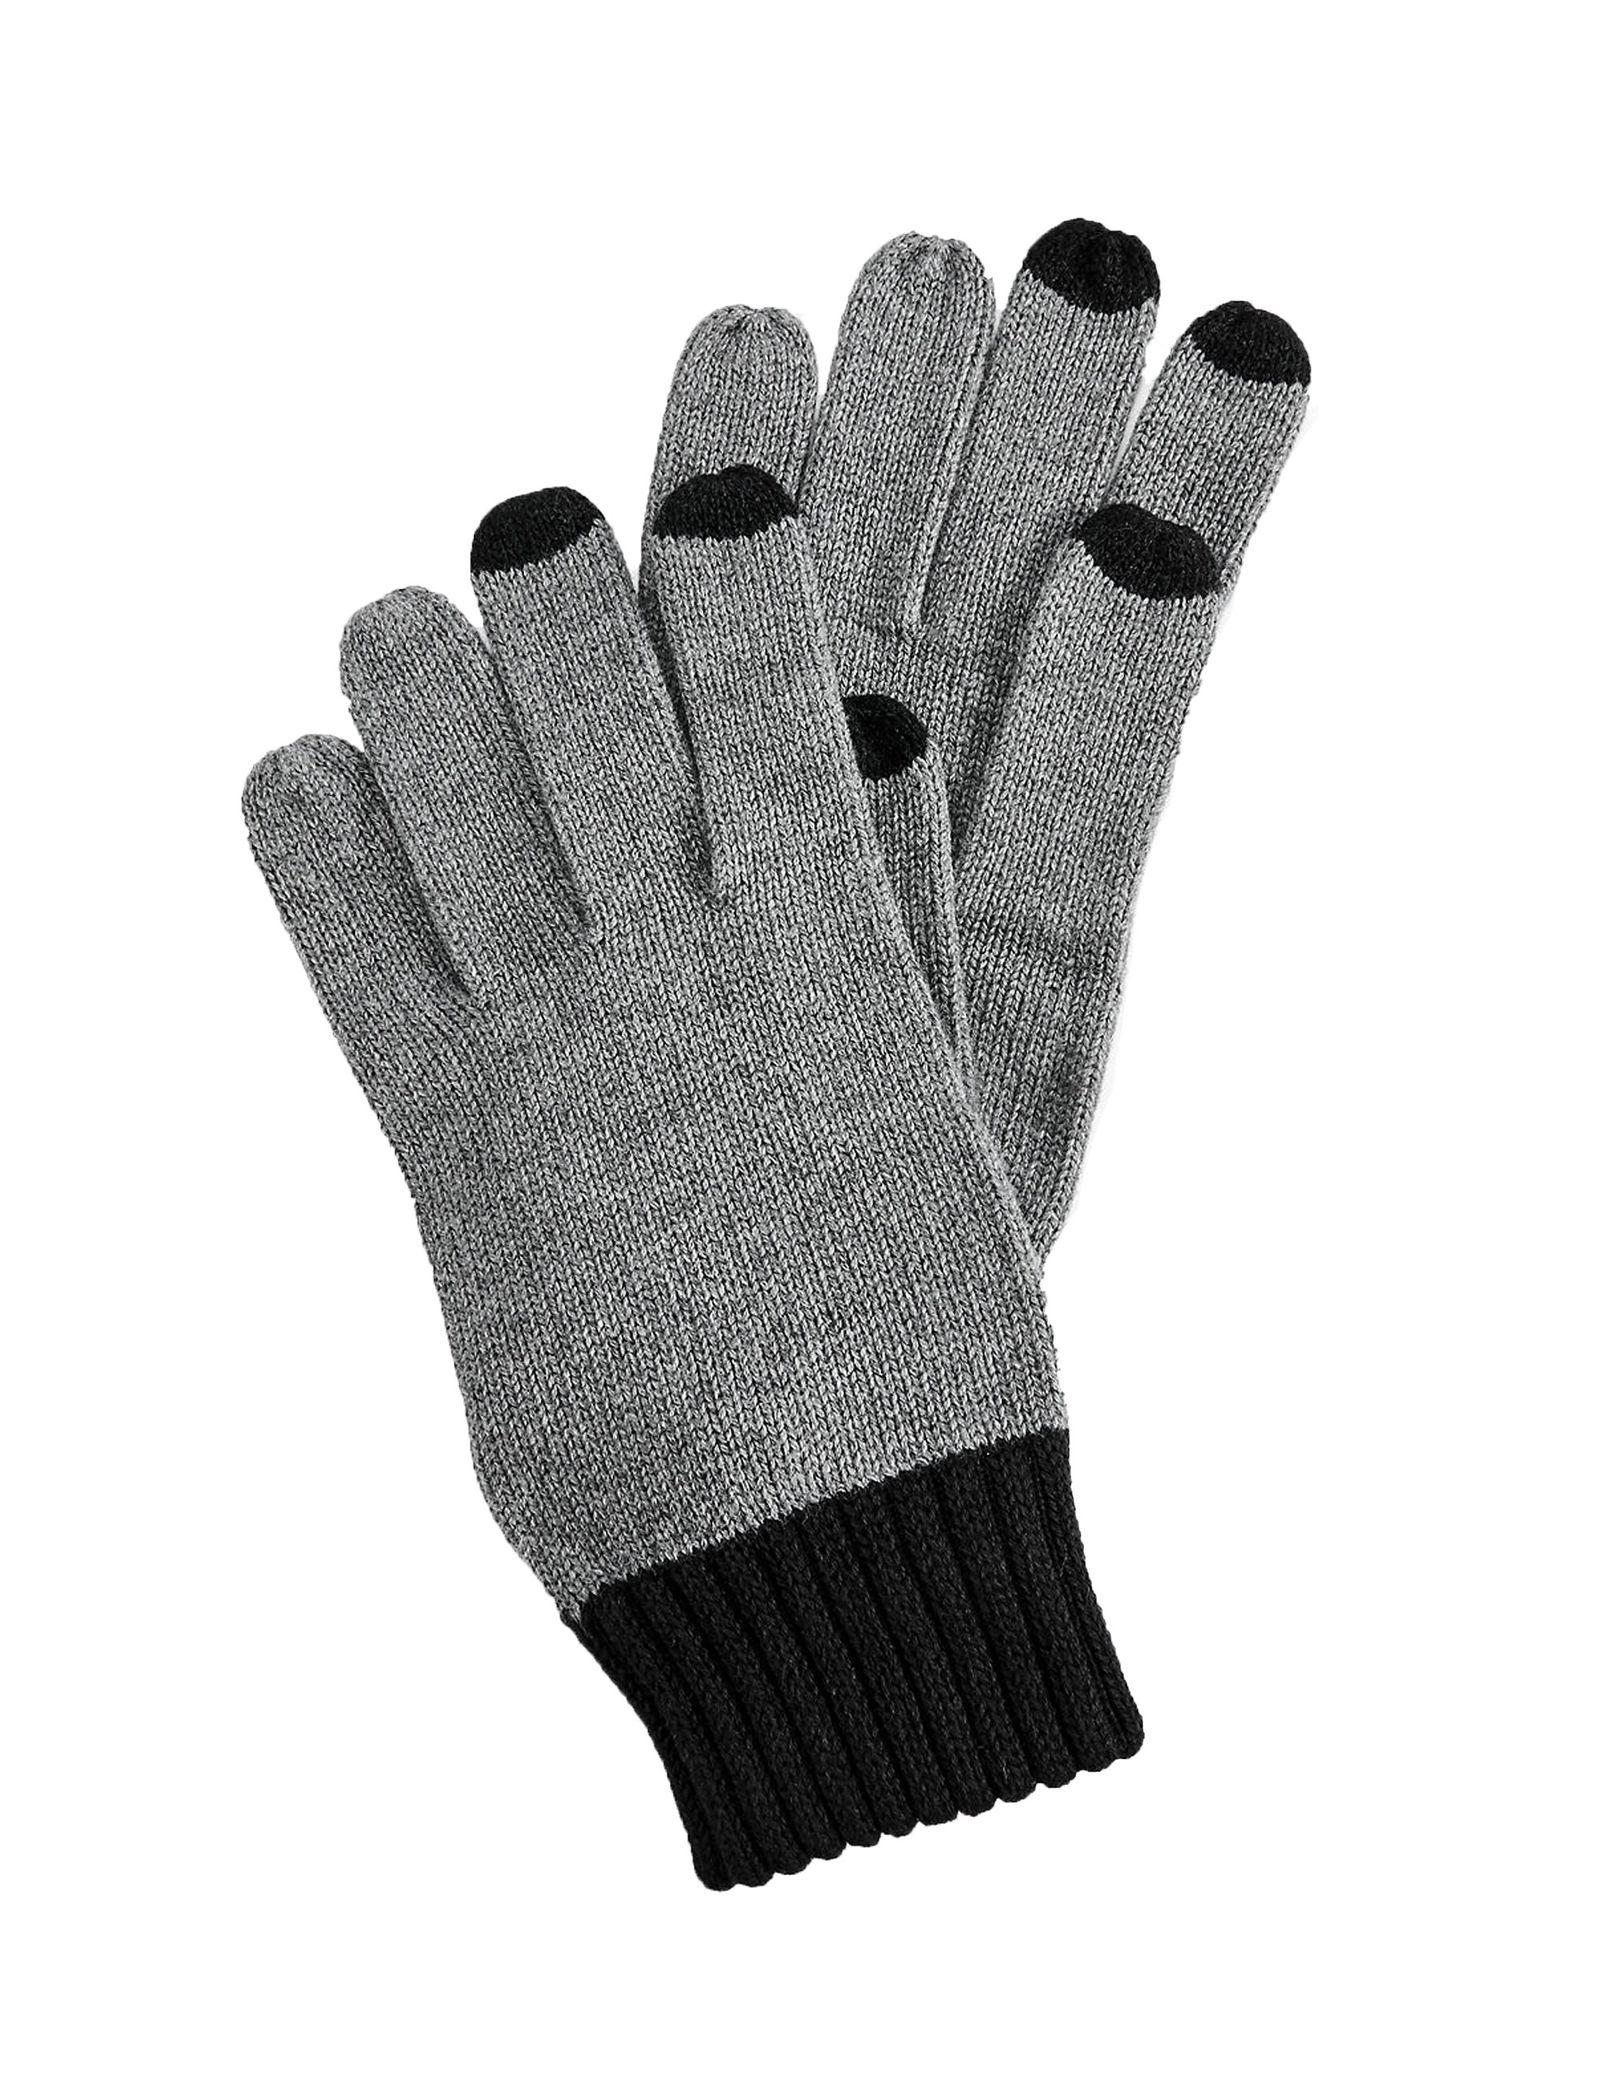 دستکش نخی ساق بلند مردانه - اس.اولیور - طوسي - 1